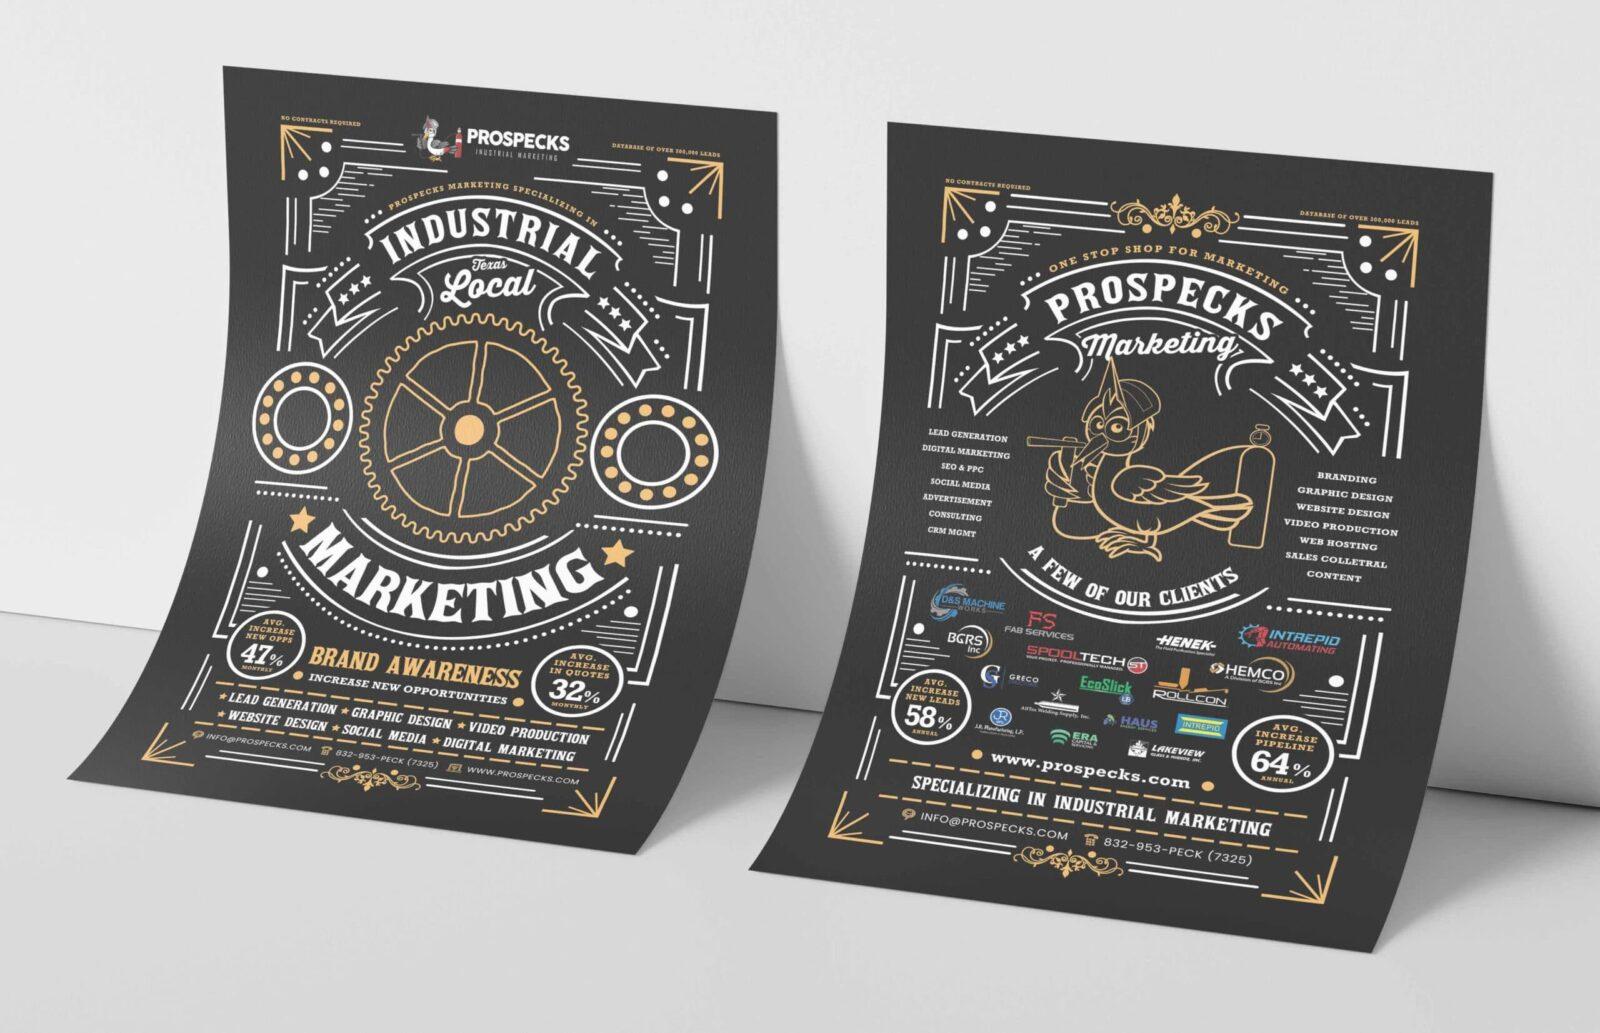 Houston Marketing | Industrial Marketing